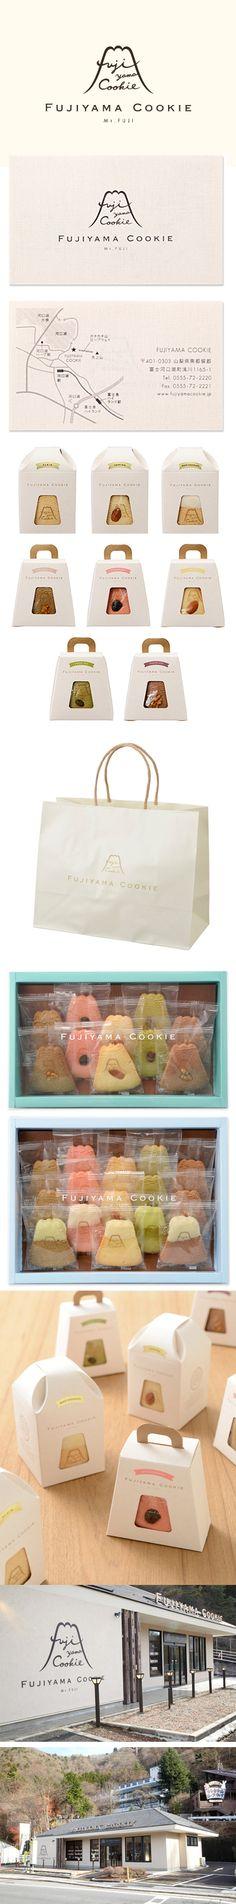 Woo Hoo here's the whole Fujiyama cookie #identity #packaging #branding story PD